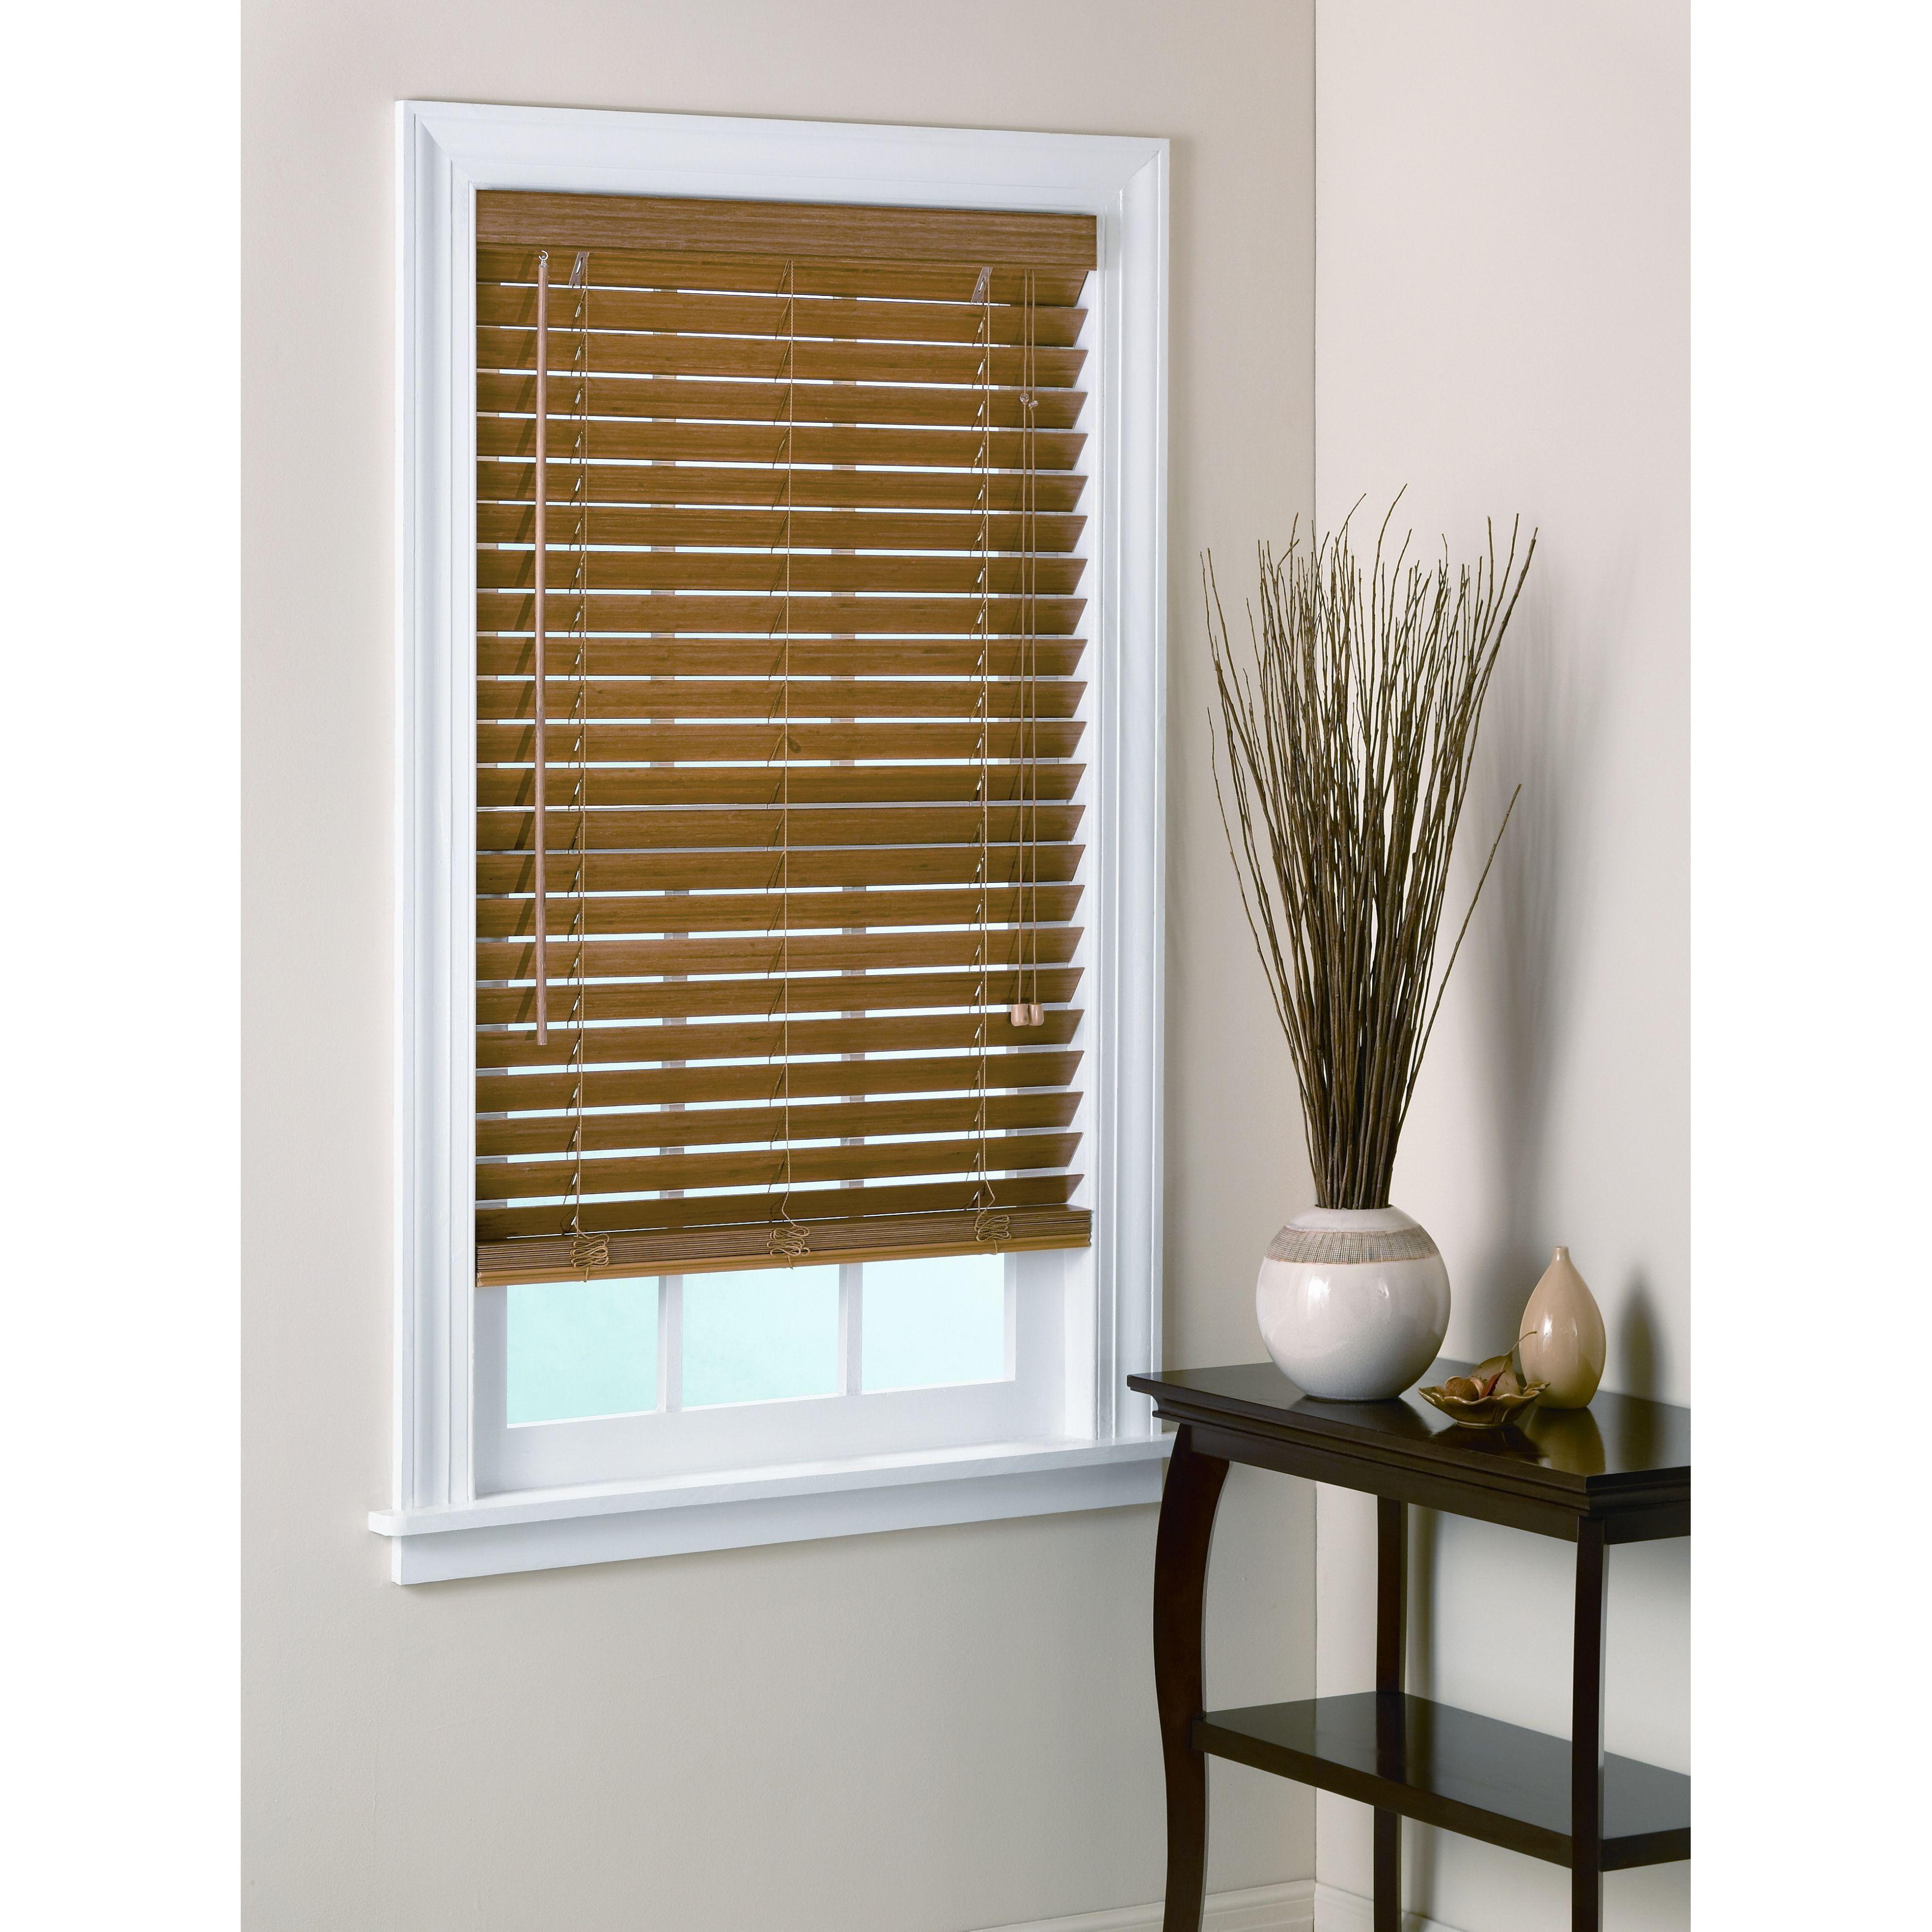 Garden window coverings  uhf pecan window blind x  new window treatments  pinterest